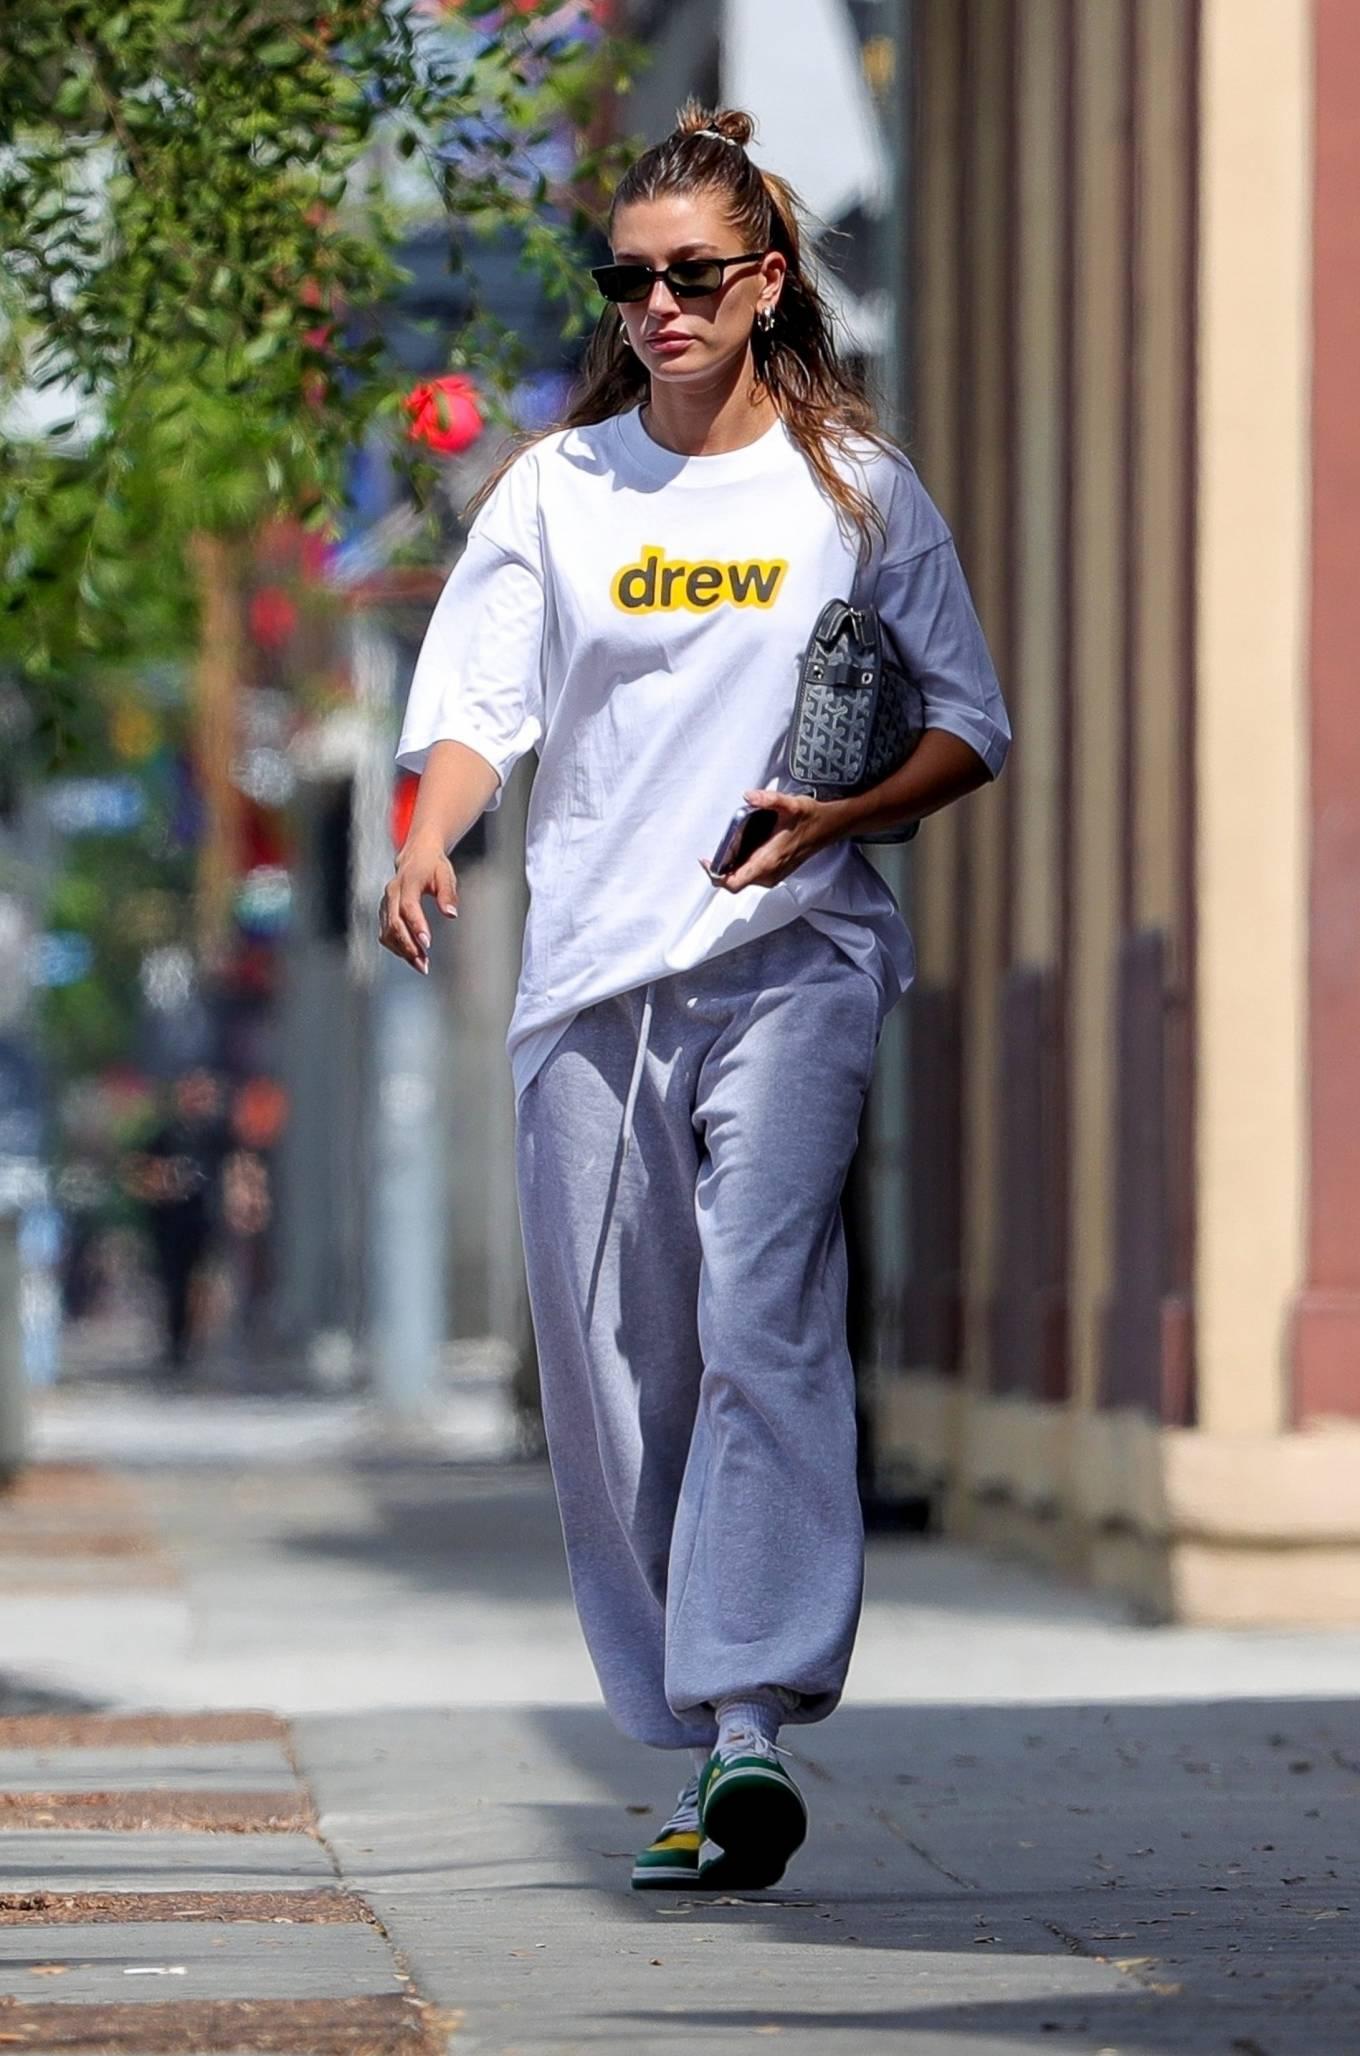 Hailey Baldwin wearing brand logo green yellow lace-up sneakers by Nike